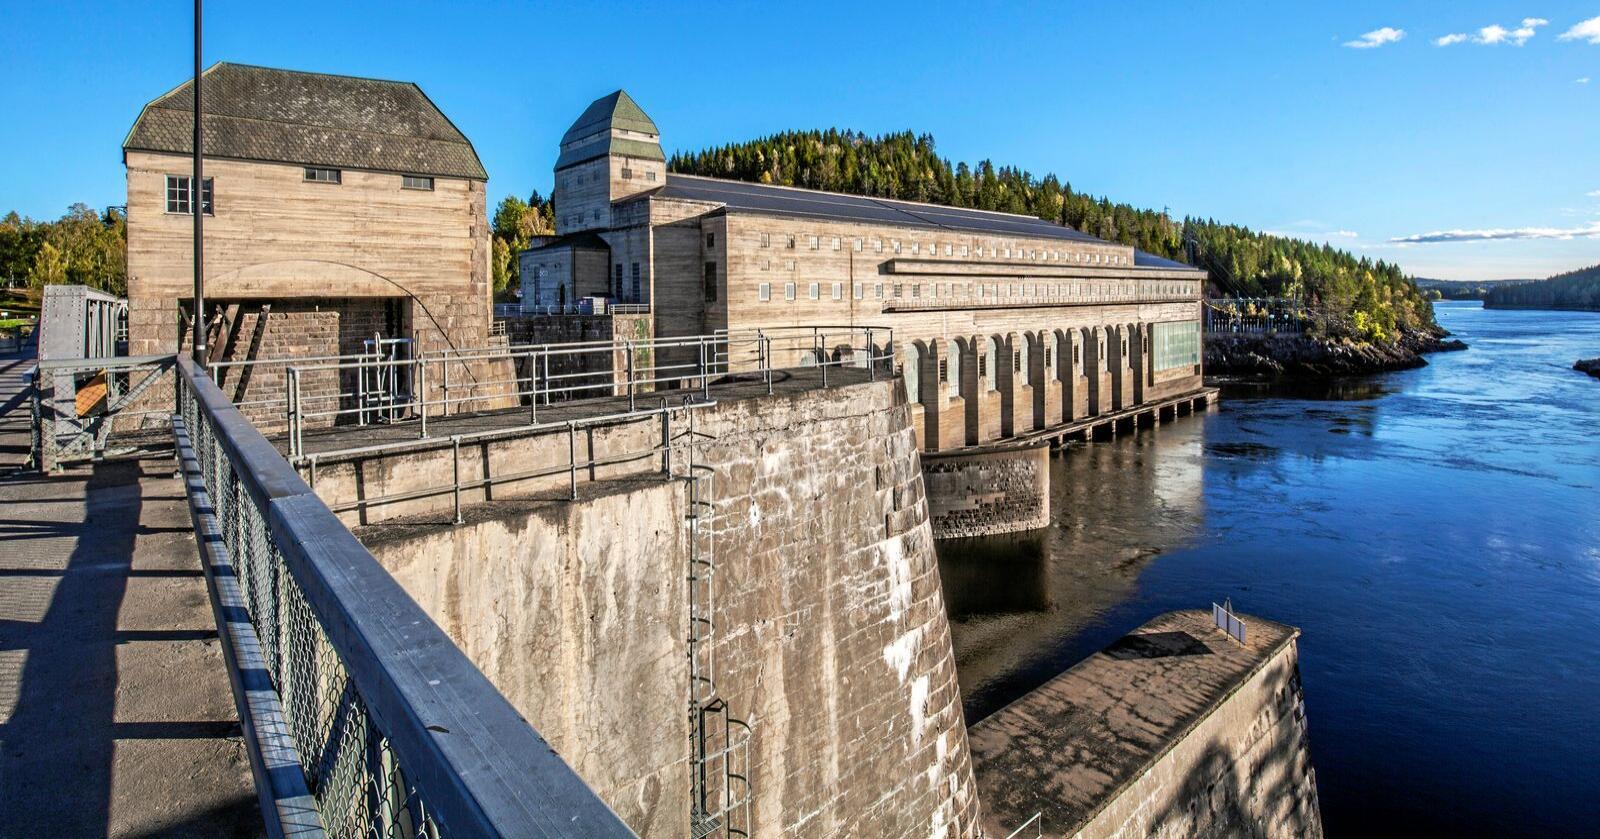 Har potensial: Det kan bli produsert meir vasskraft i Noreg. Foto: Halvard Alvik, NTB scanpix